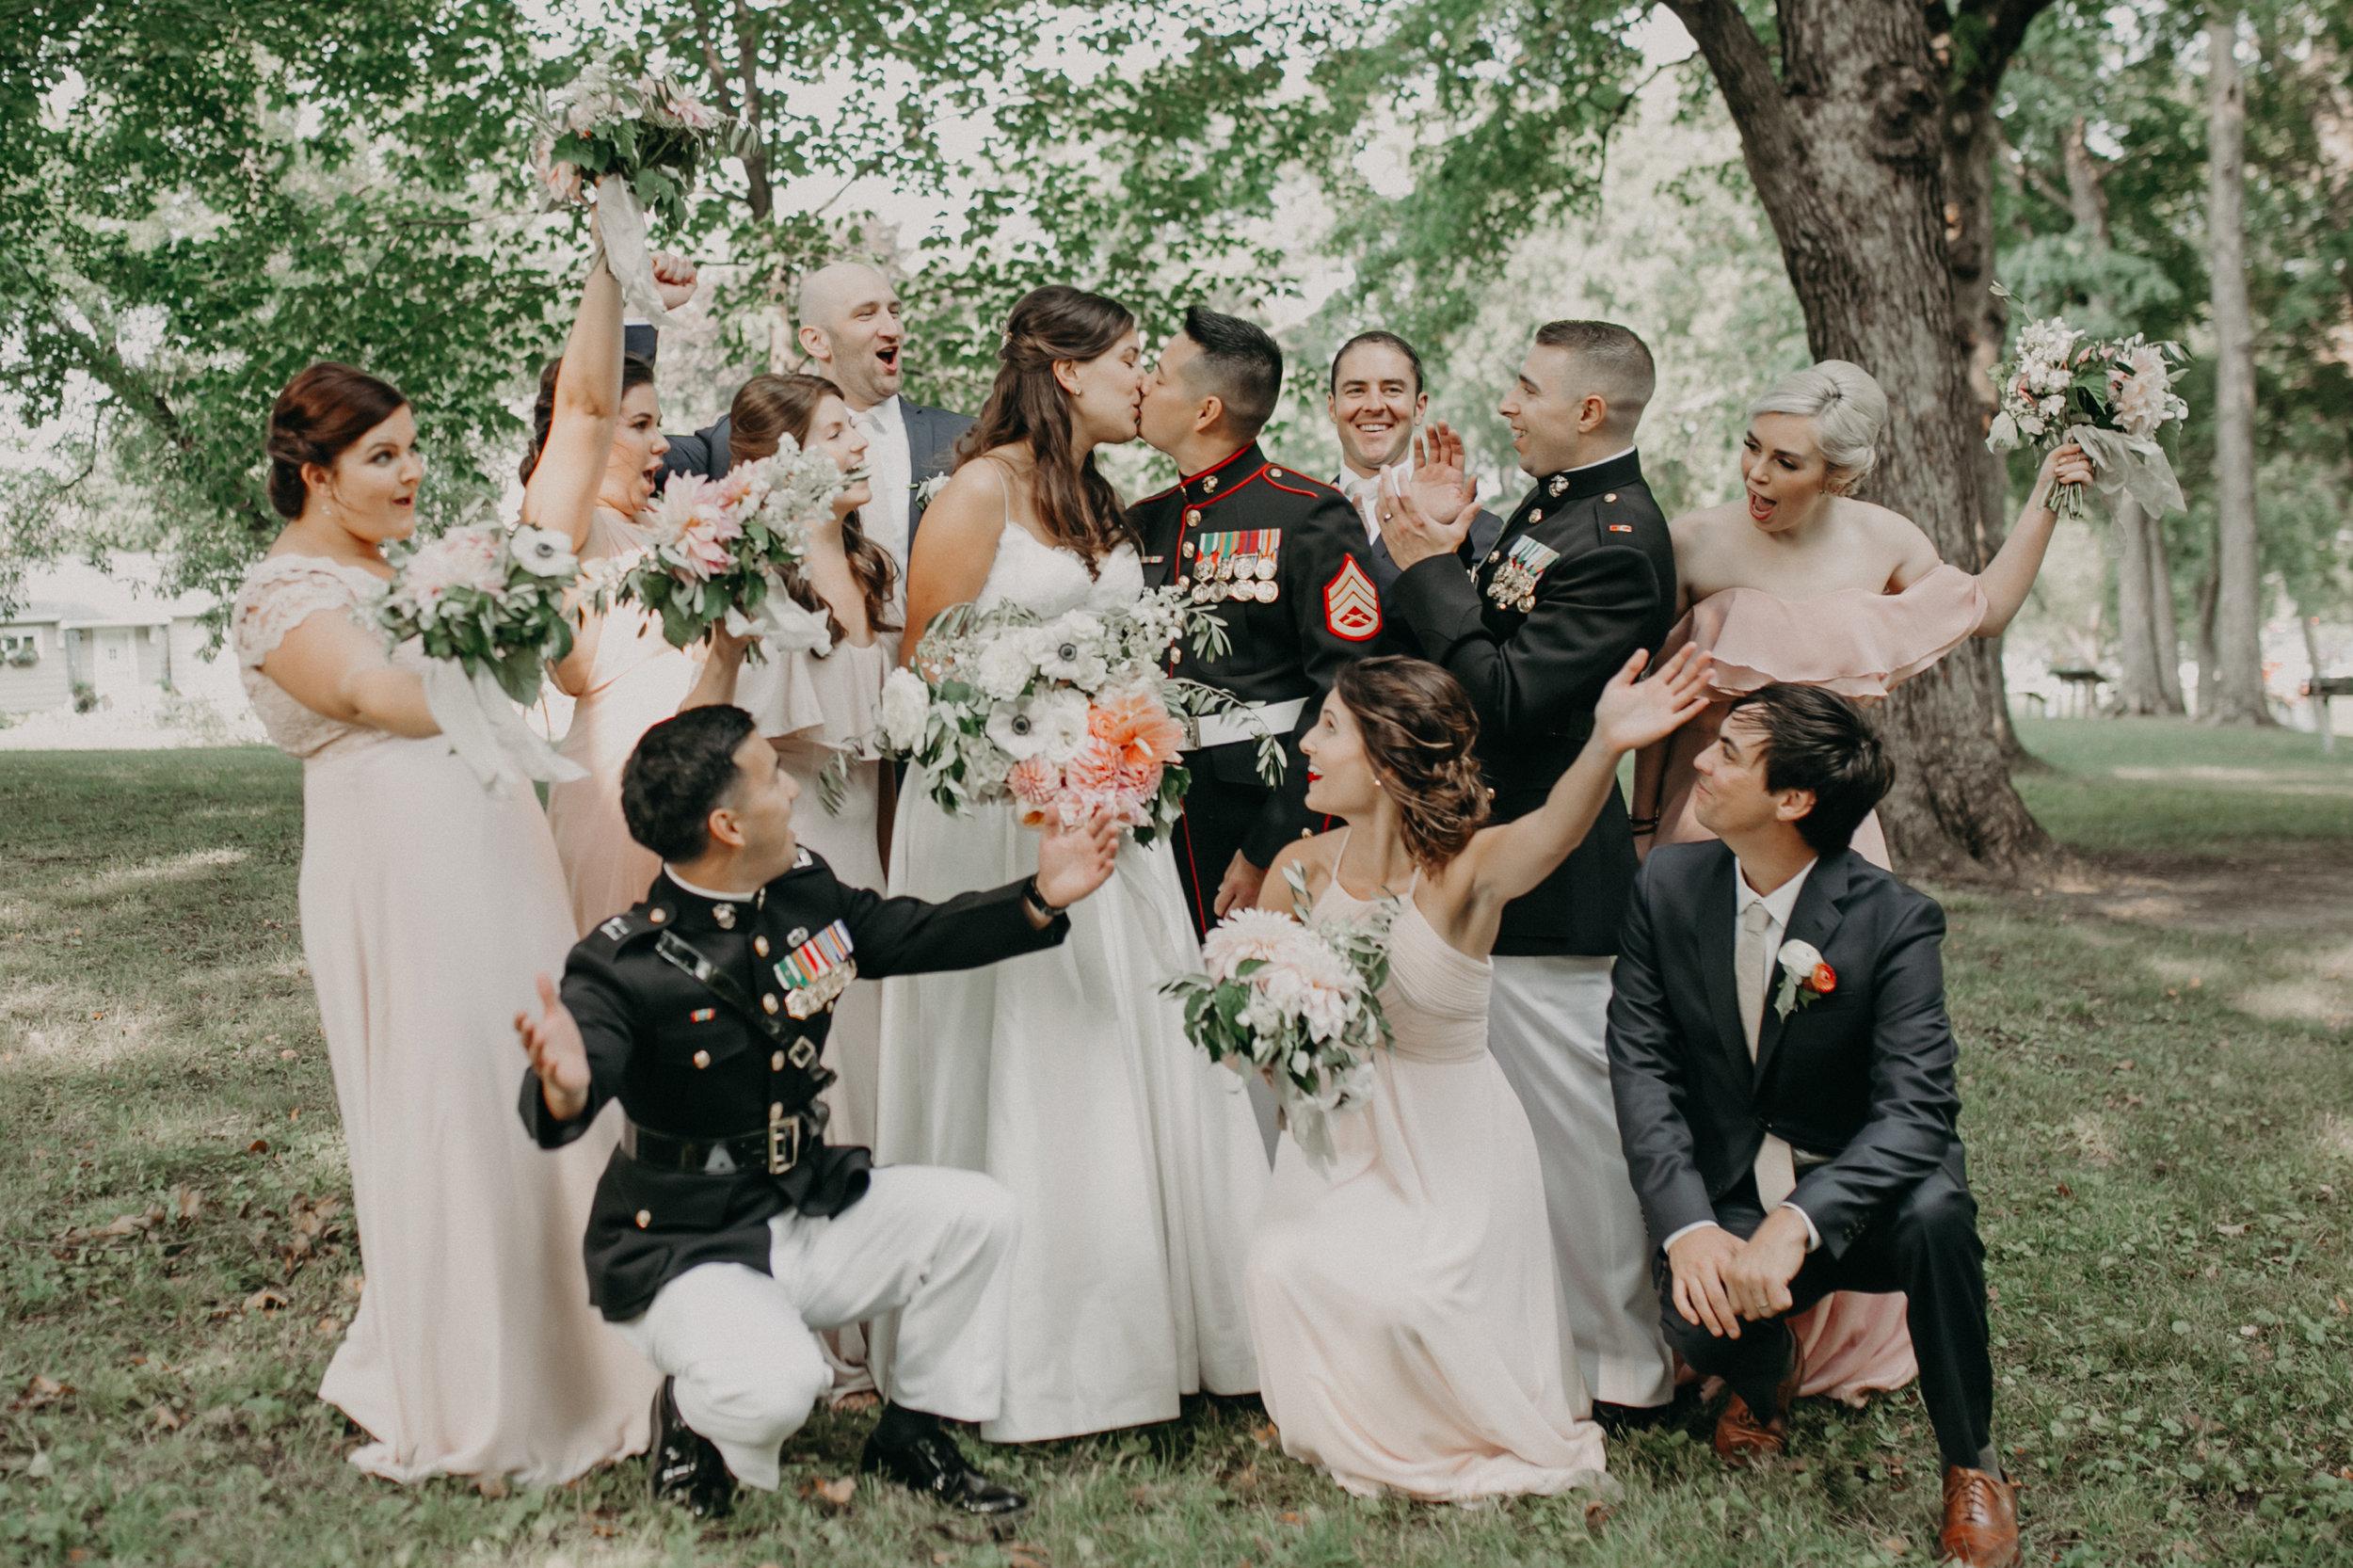 bridal party at a Lake Minnetonka wedding in Wayzata MN